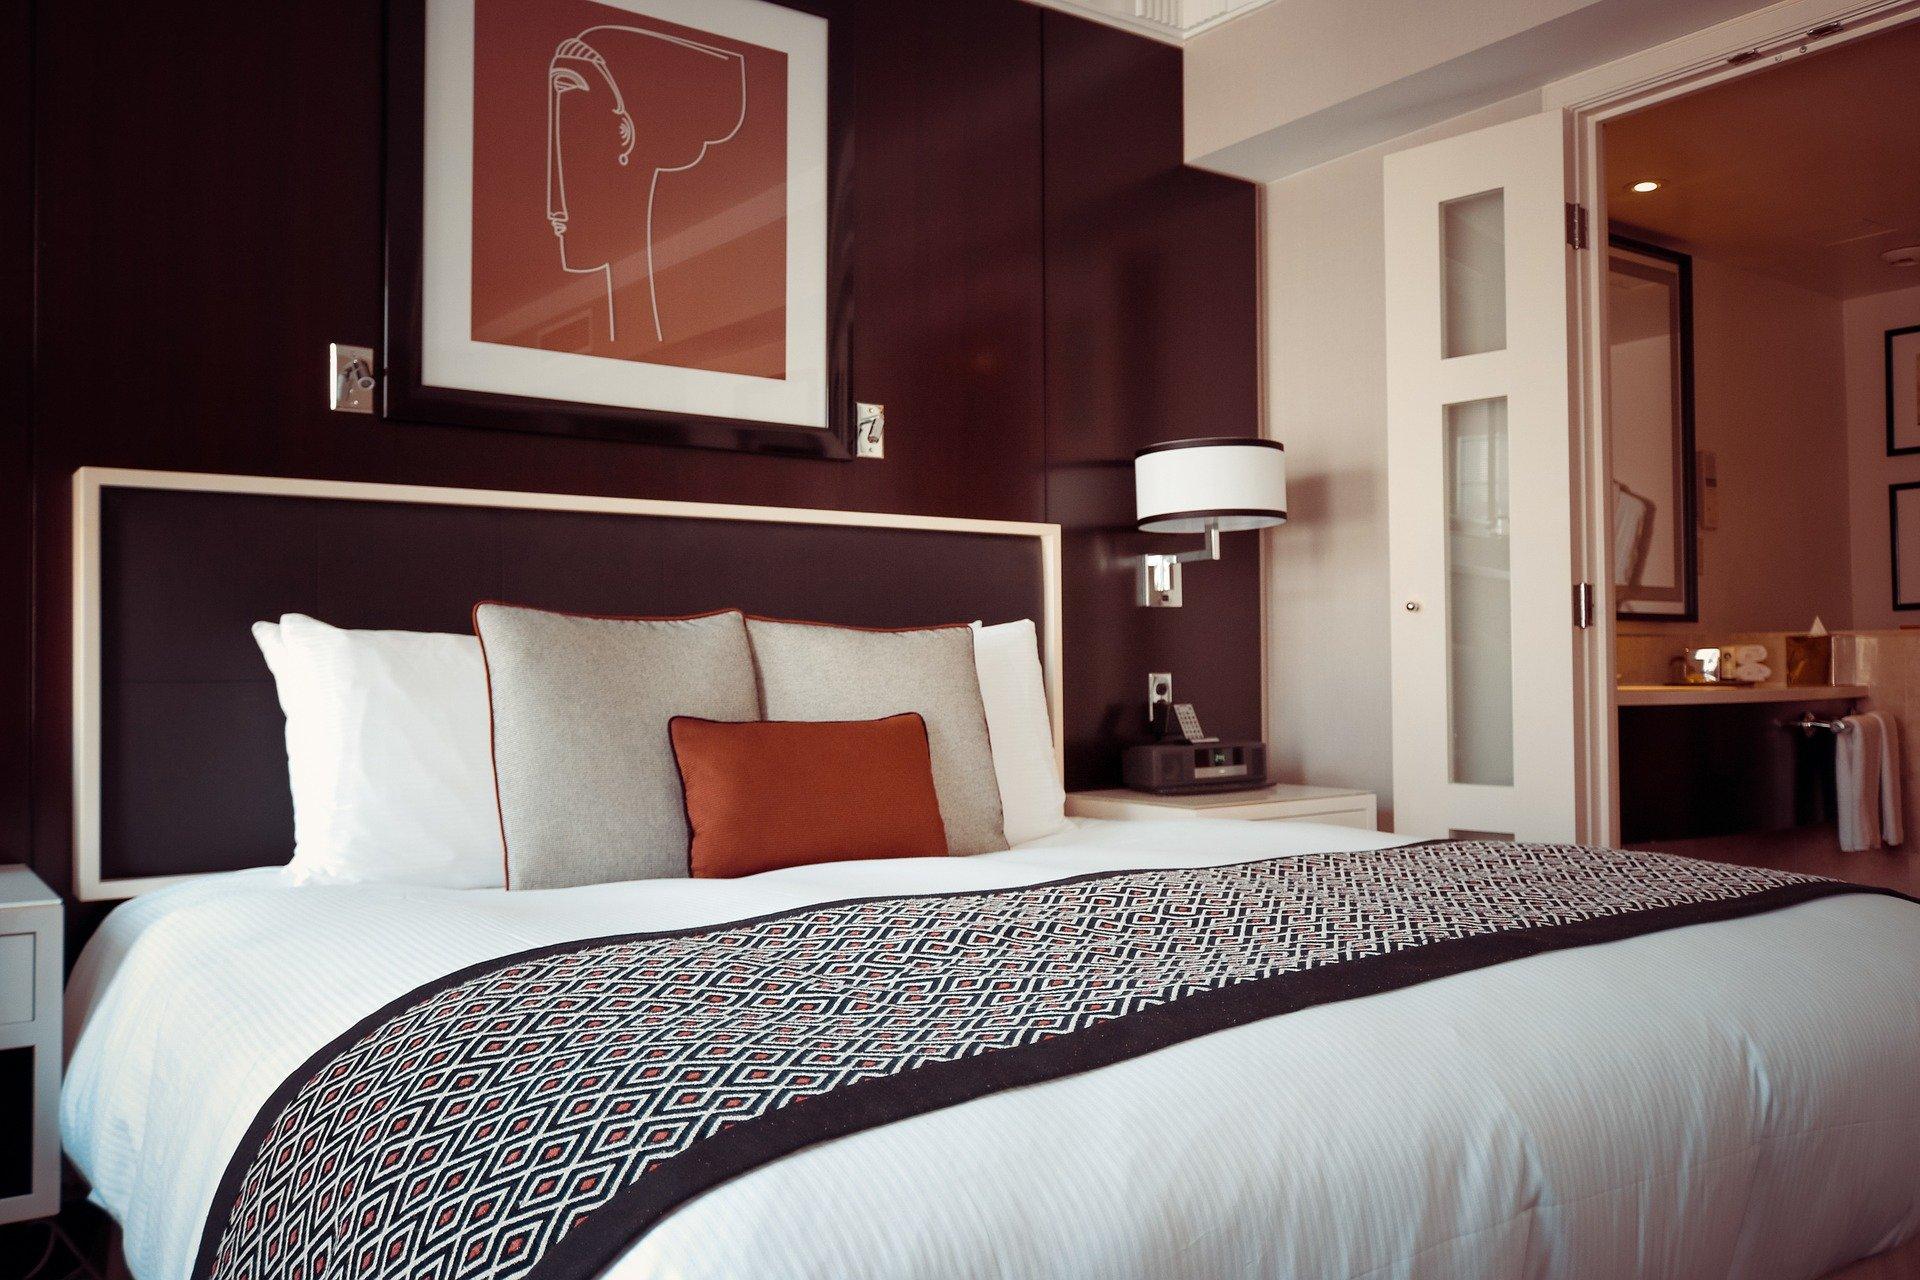 edwards & hill hotel furniture